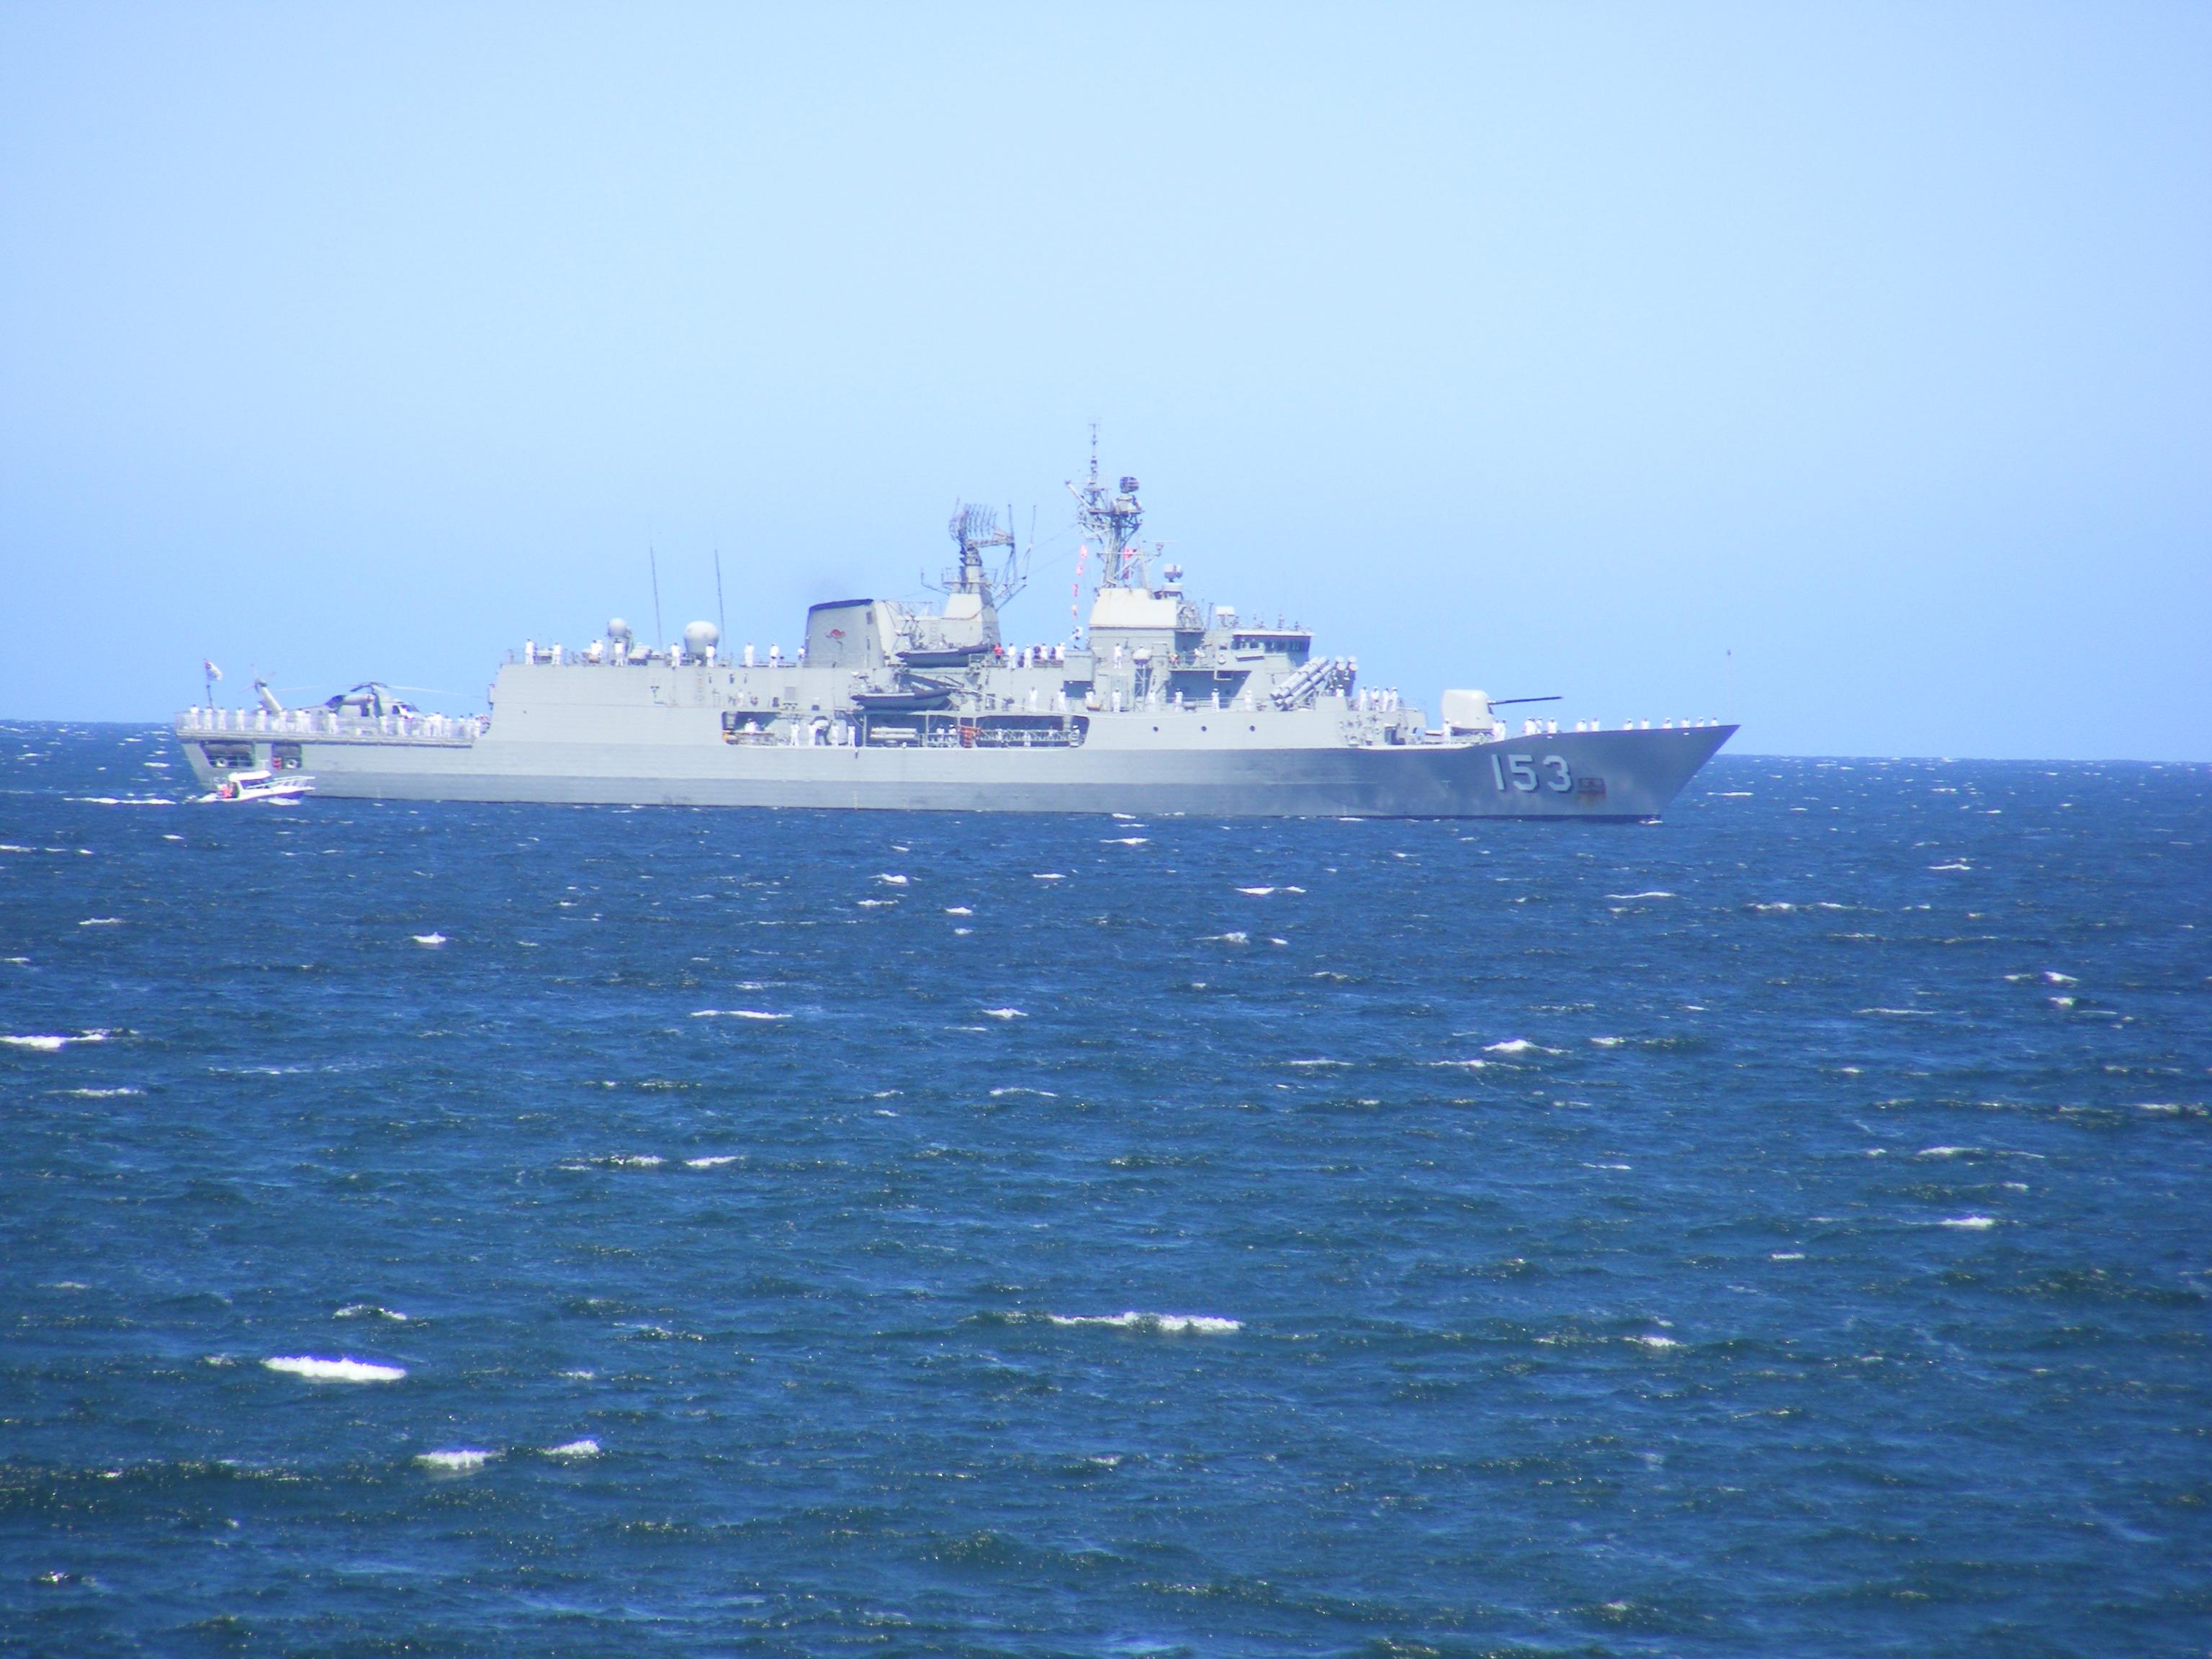 HMAS STUART in King Georges Sound 1 Nov 14